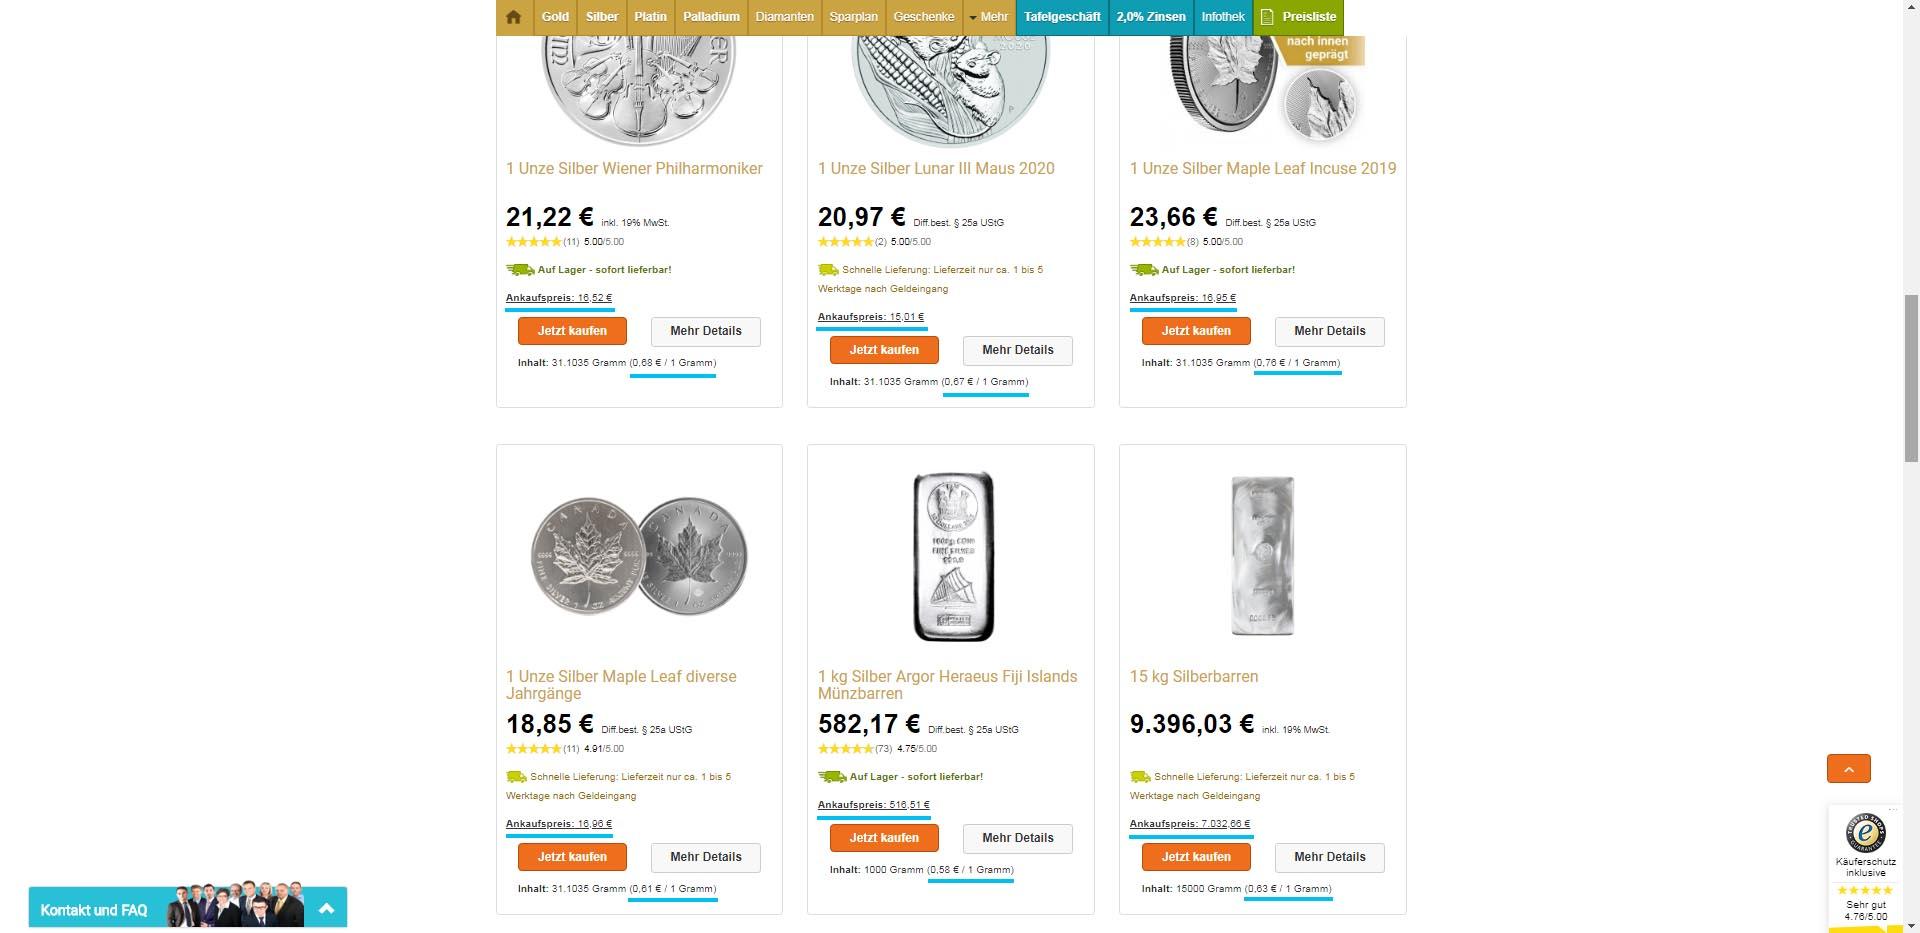 Buy-back price shown at GoldSilberShop